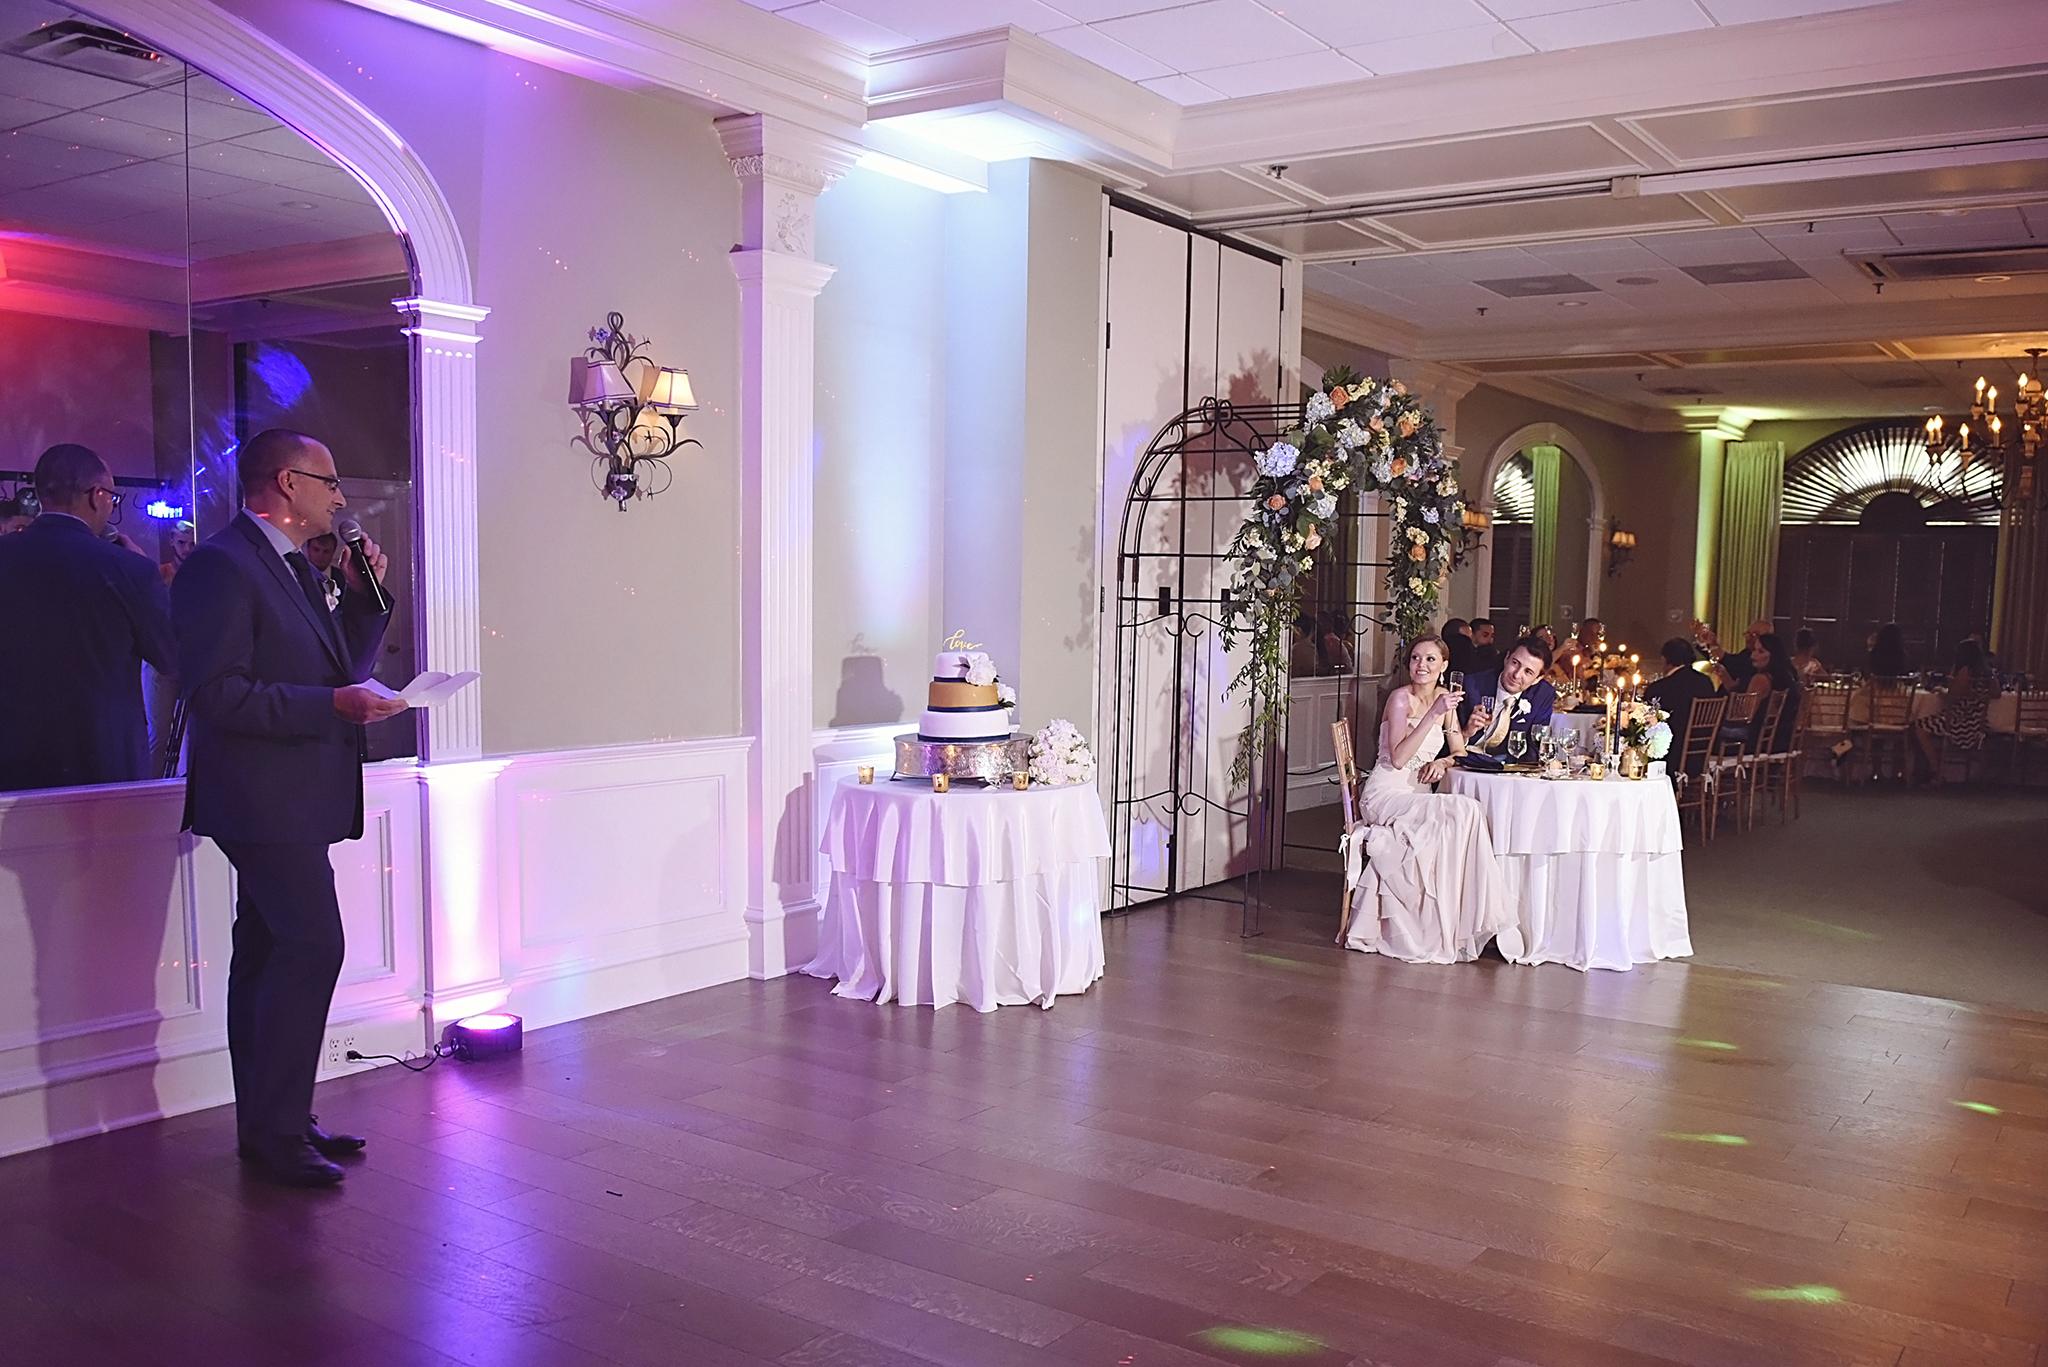 NJ-NY-wedding-photographer-158NJ-NY-wedding-photographer-158NJ-NY-WEDDING-PHOTOGRAPHER-158.JPG